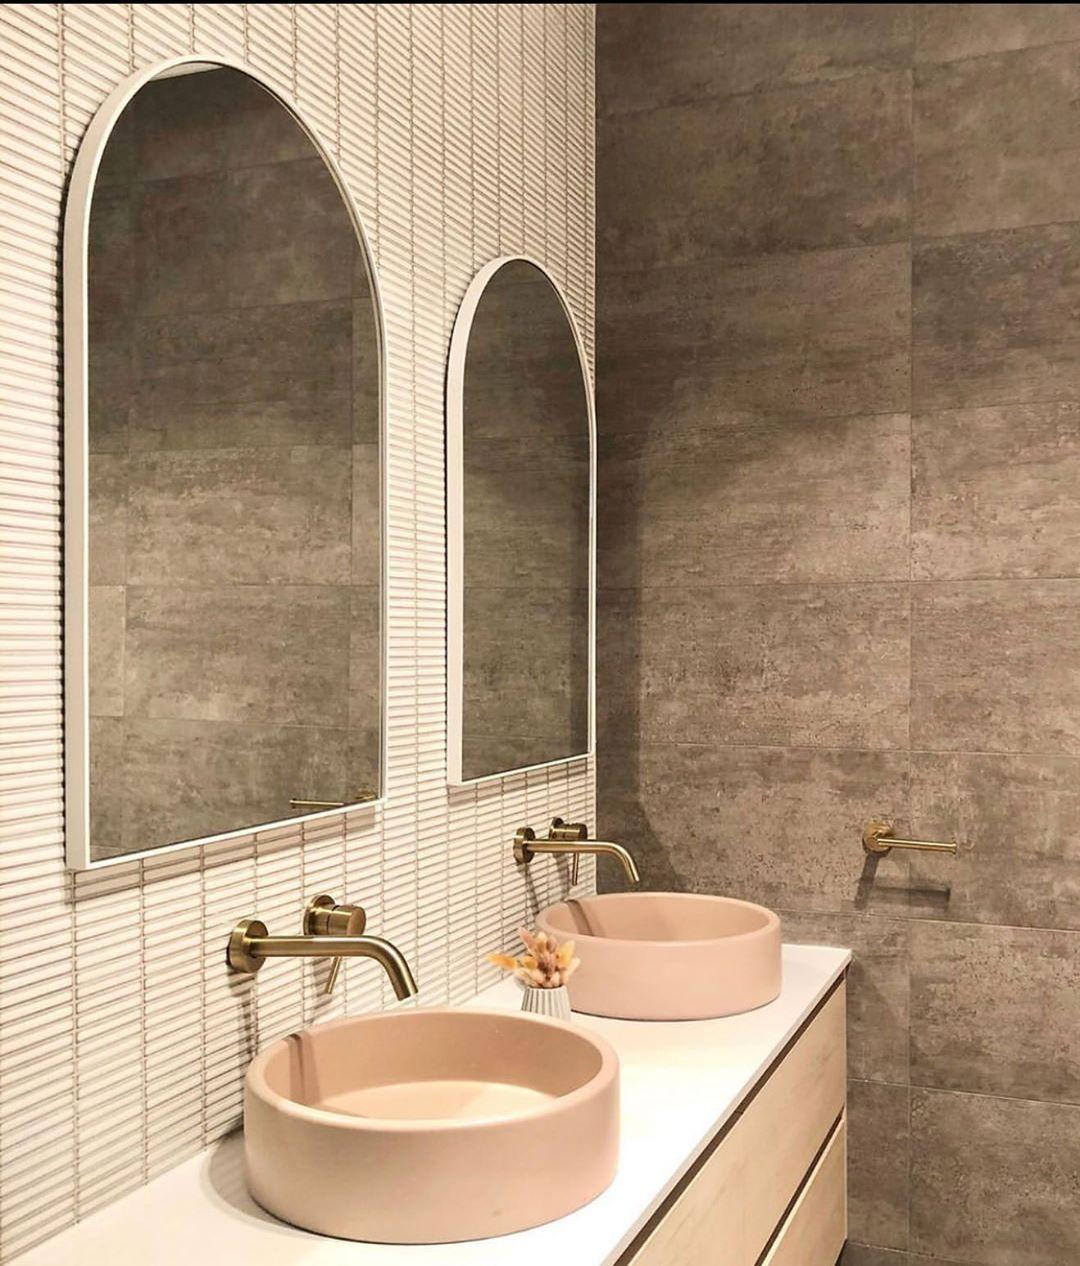 Tumblr In 2020 Concrete Bathroom Bathroom Basin Concrete